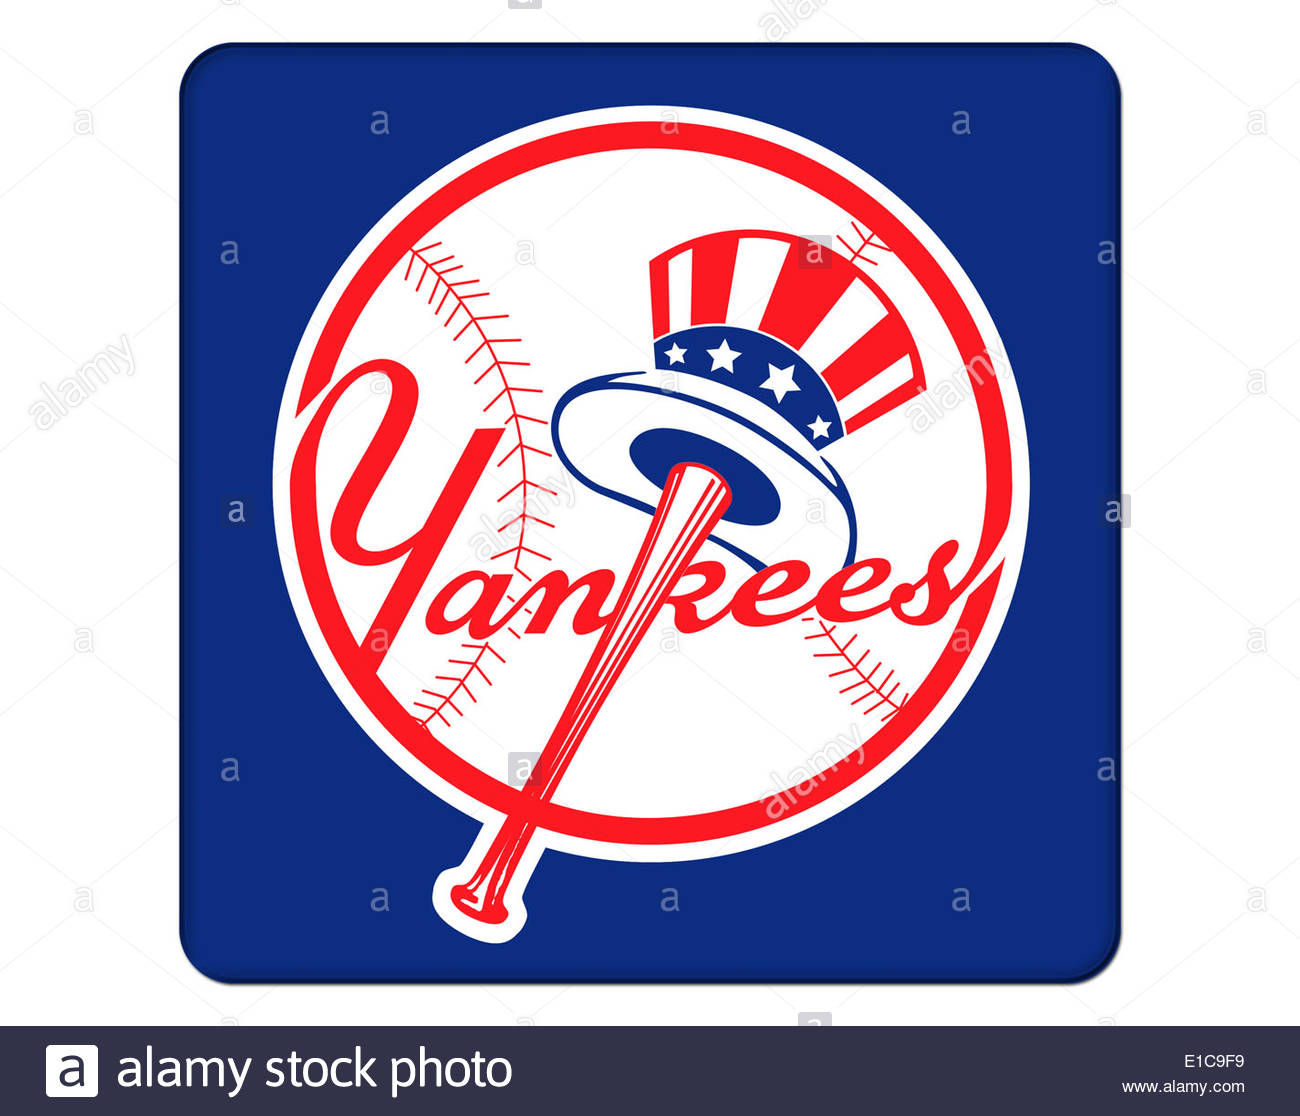 New york yankees logo stock photos new york yankees logo stock new york yankees icon logo isolated app button stock image biocorpaavc